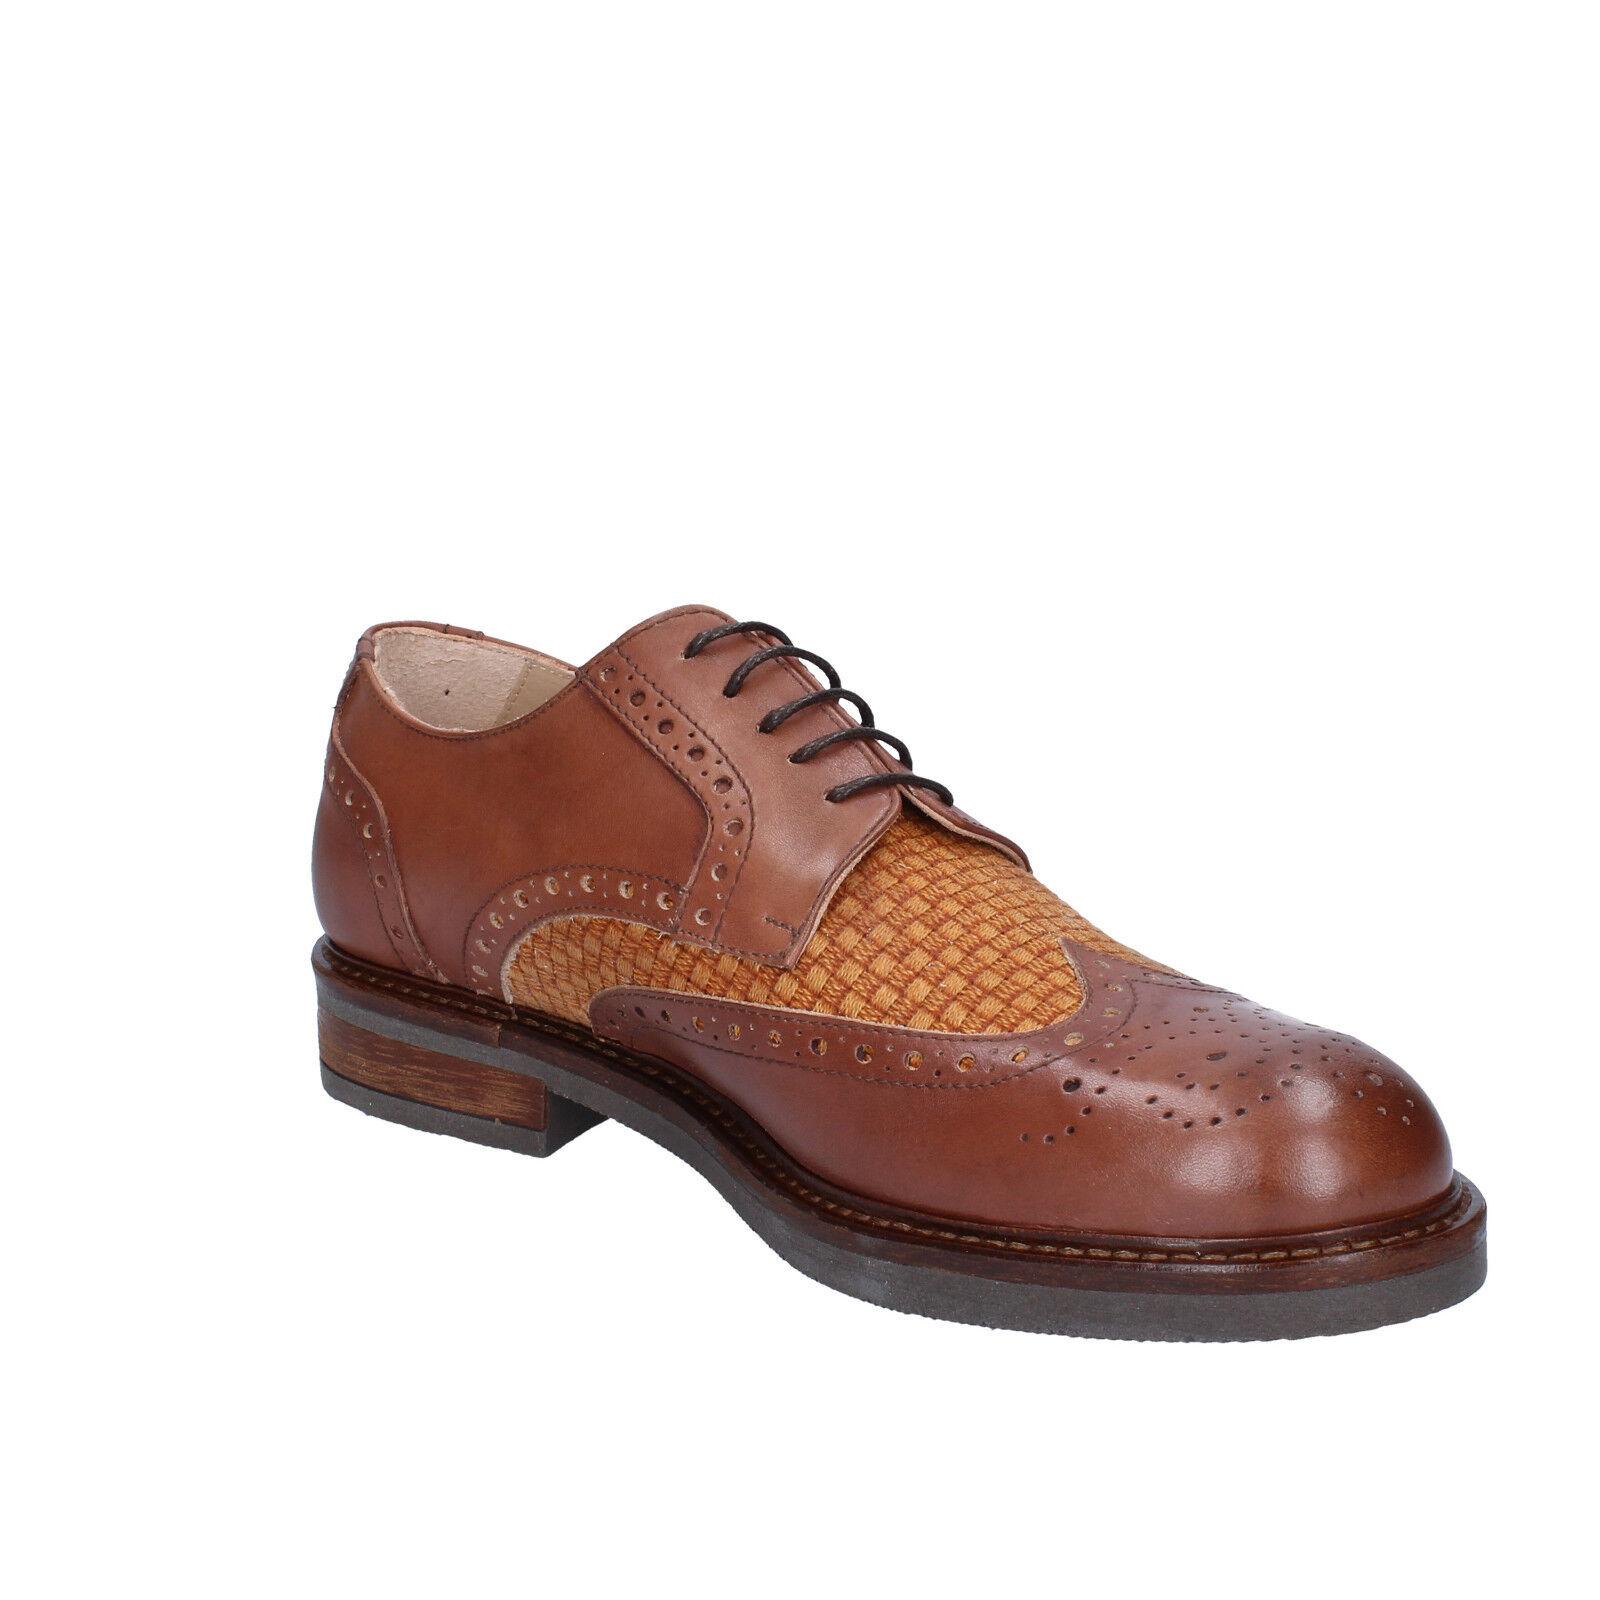 Herren schuhe braun FDF Schuhe 41 EU elegante braun schuhe leder textil BZ344-C 1dfb5c